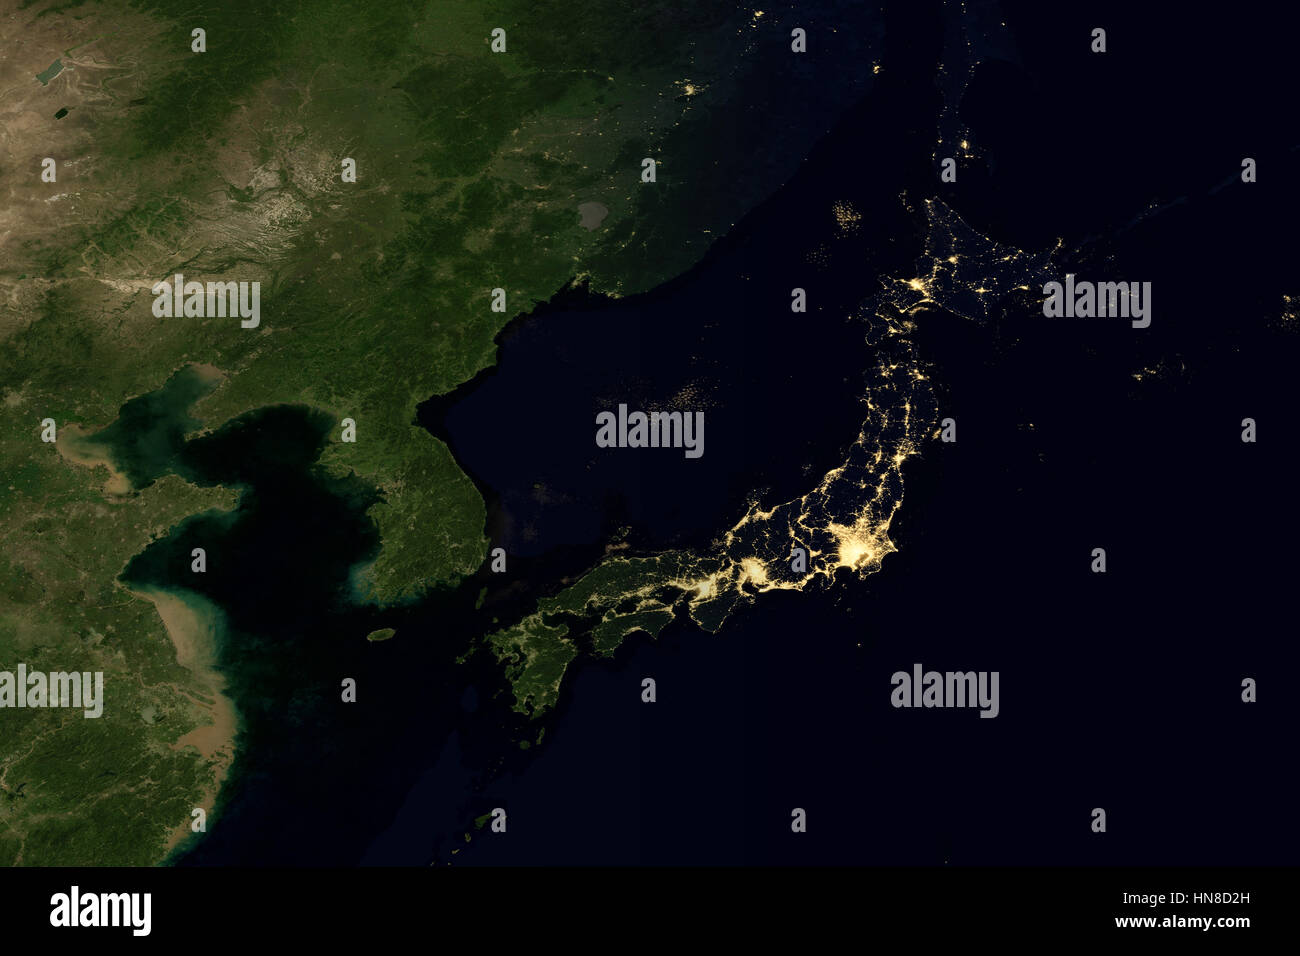 Night globe city light map asia east stock photos night globe city city lights on world map japan stock image gumiabroncs Images